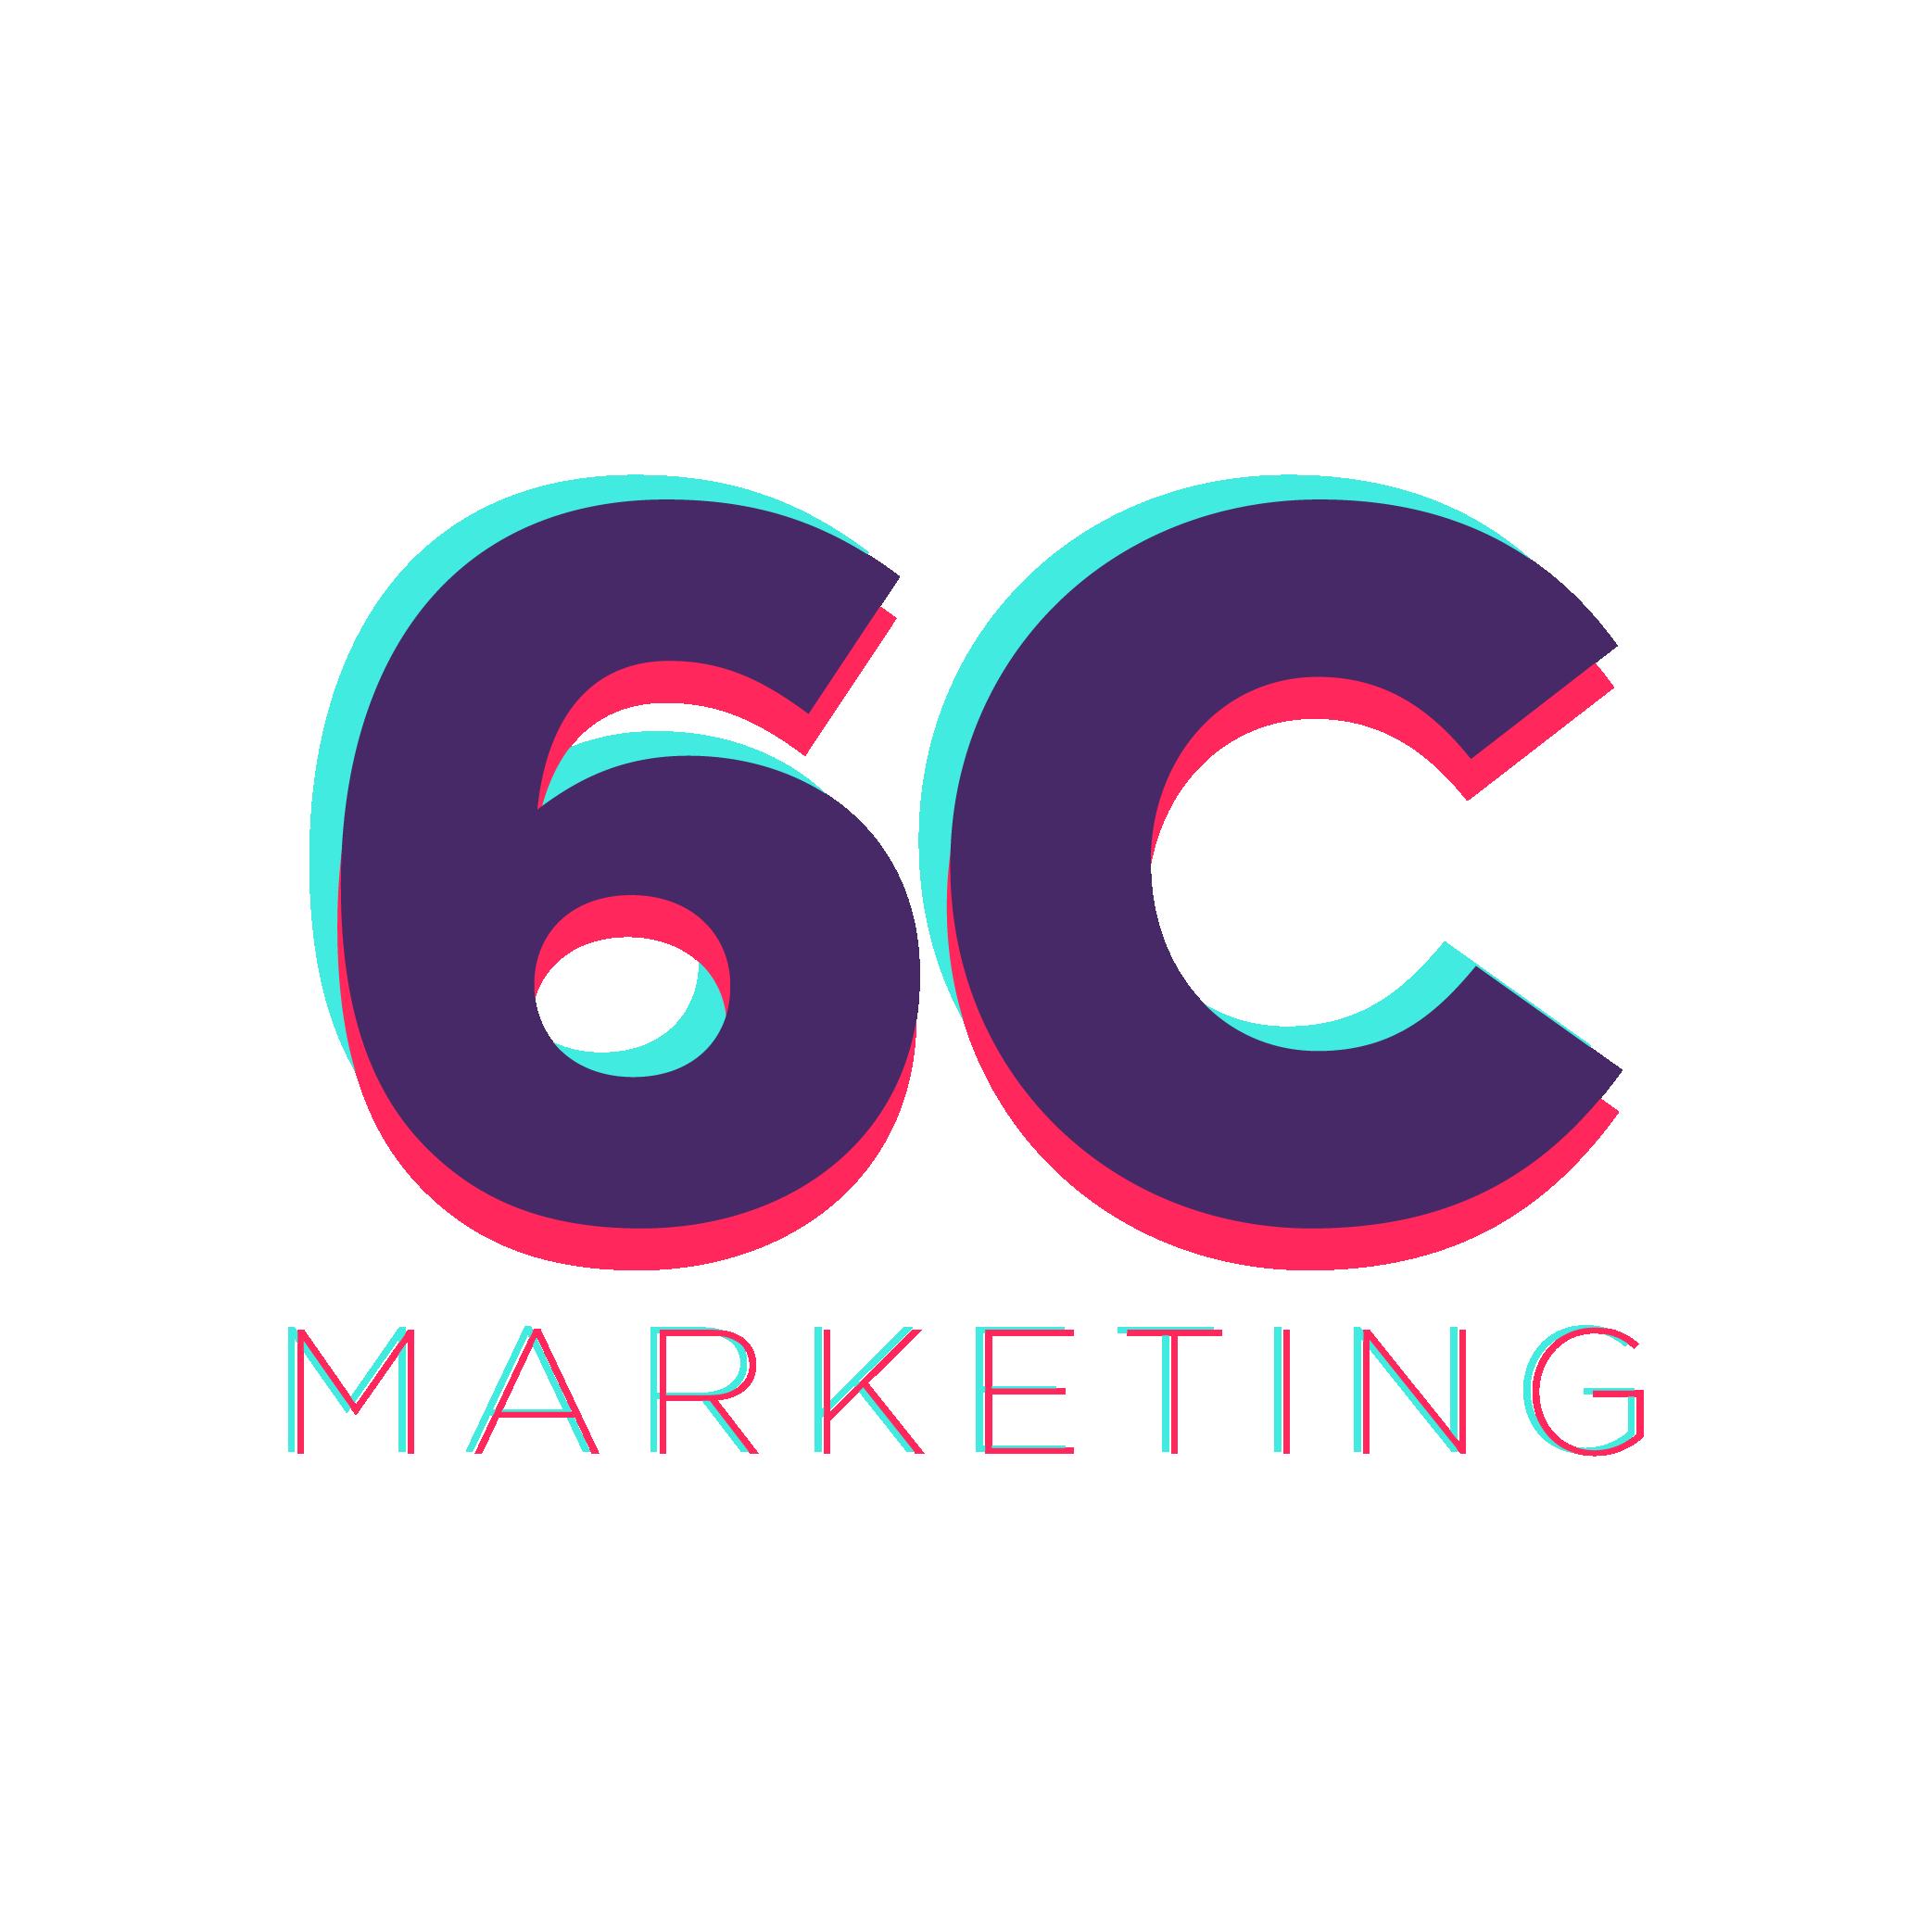 6C Marketing Logo